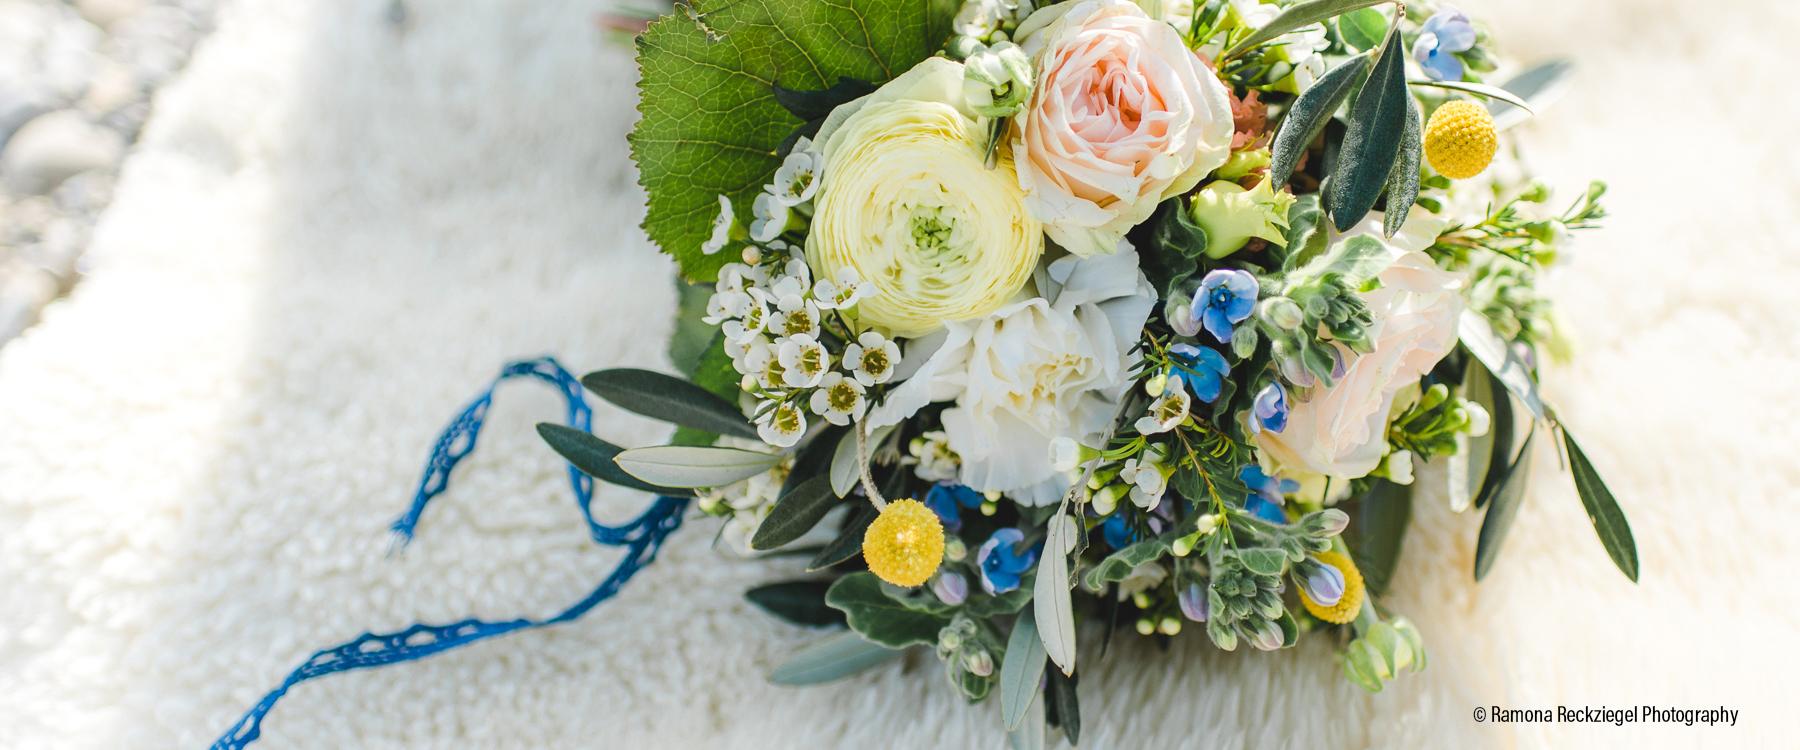 wedding-fotos-cinema-rrp-9299.jpg